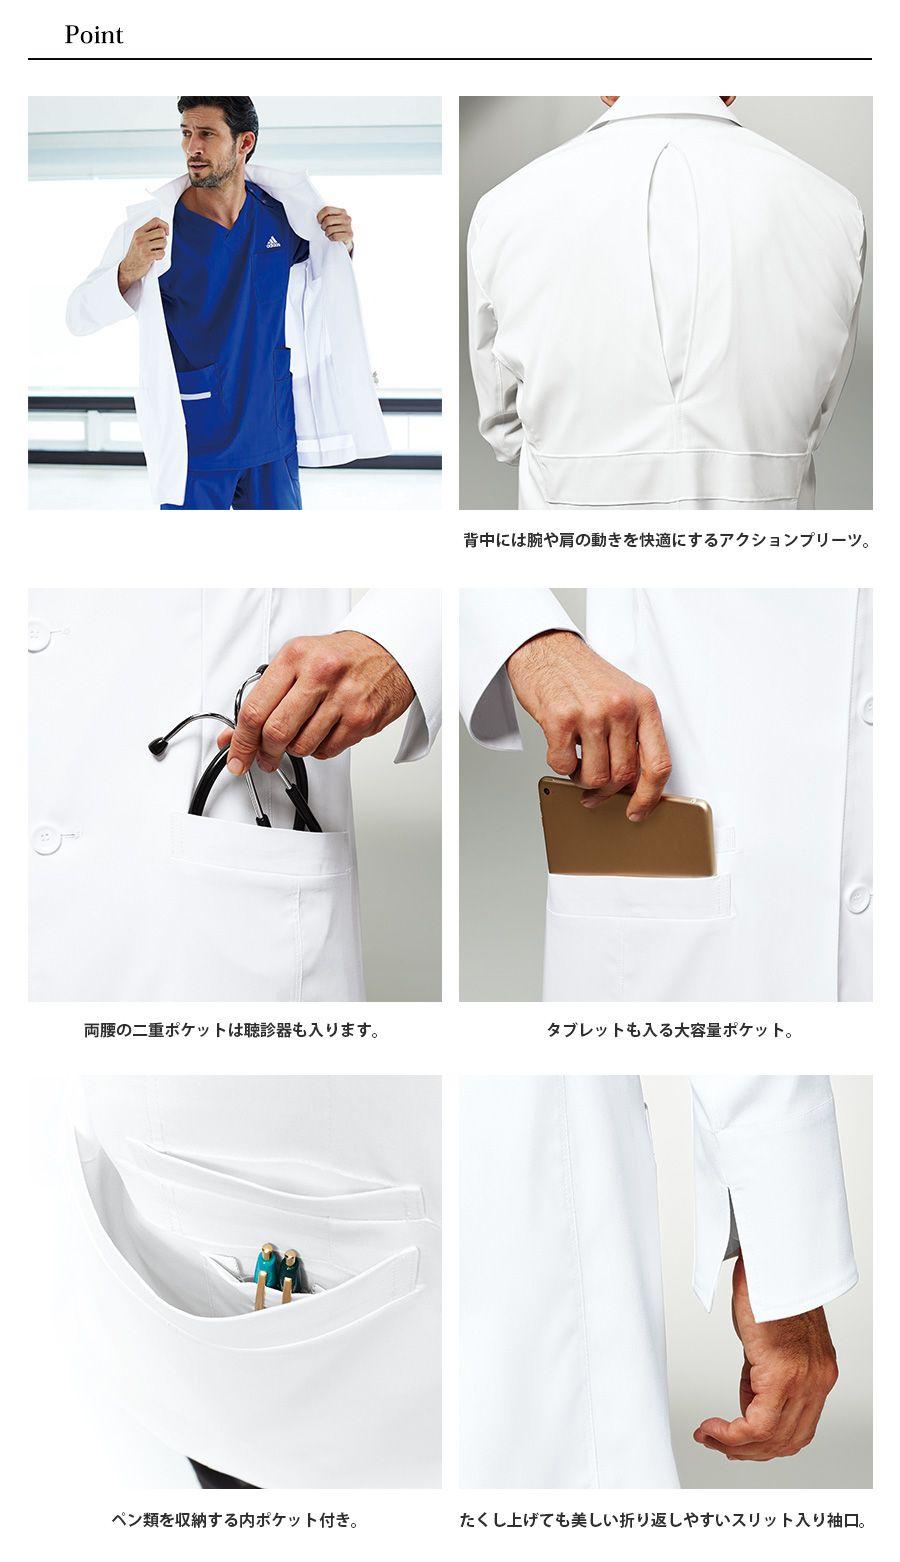 【adidas】アディダス メンズドクターコート※廃番・返品不可※